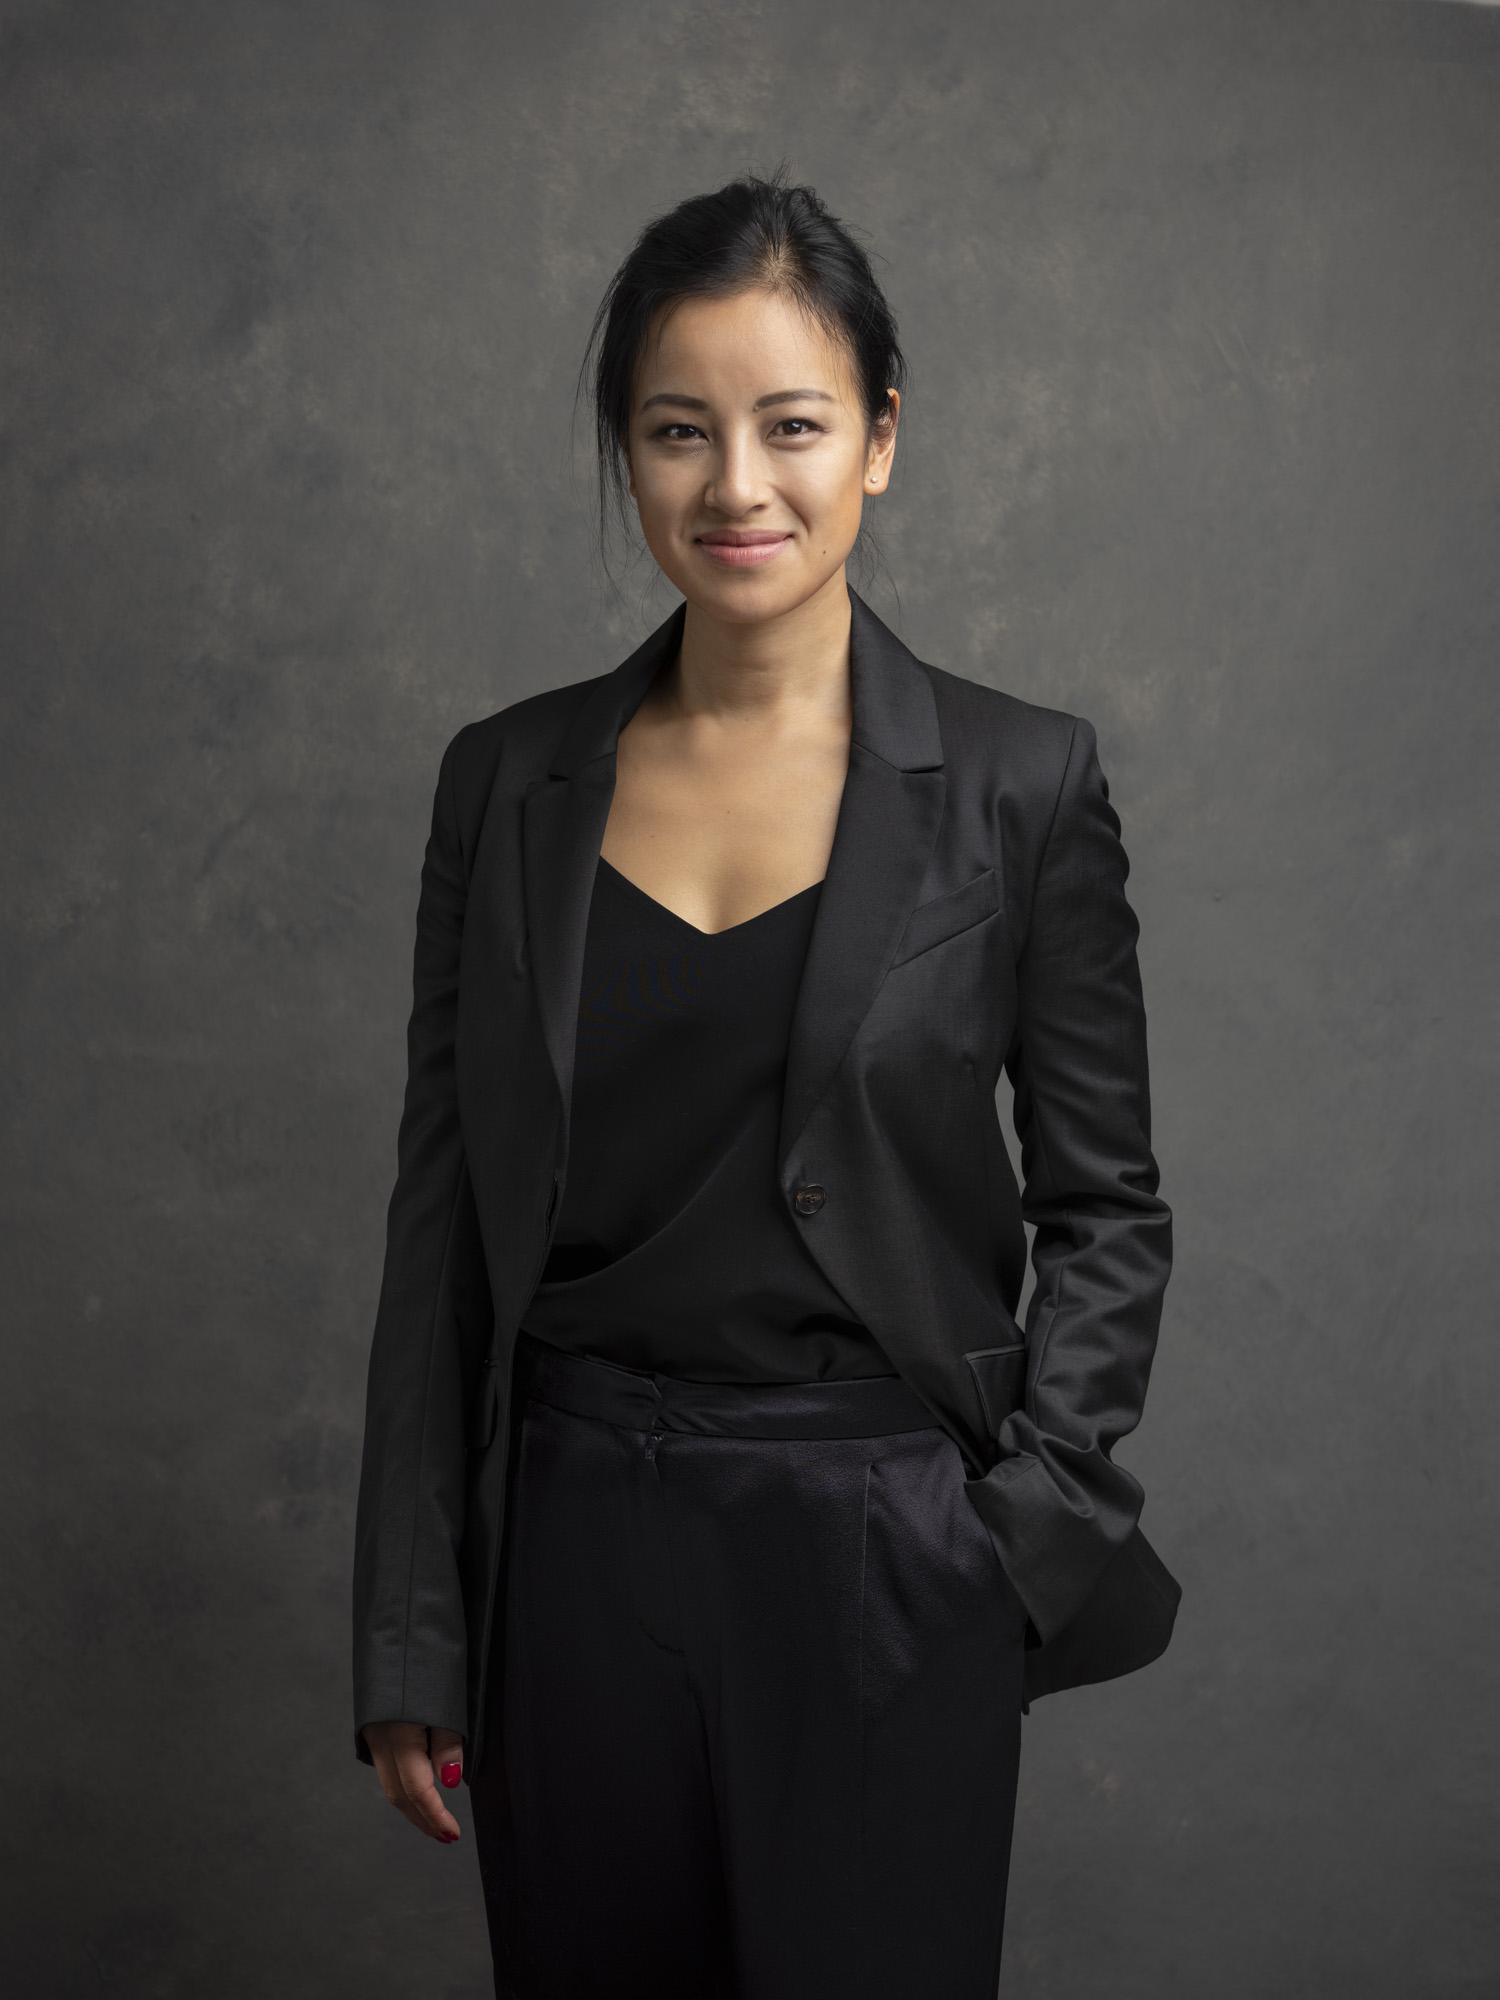 Corporate headshot portrait linkedin profil photography studio singapore services asia photographer black jacket